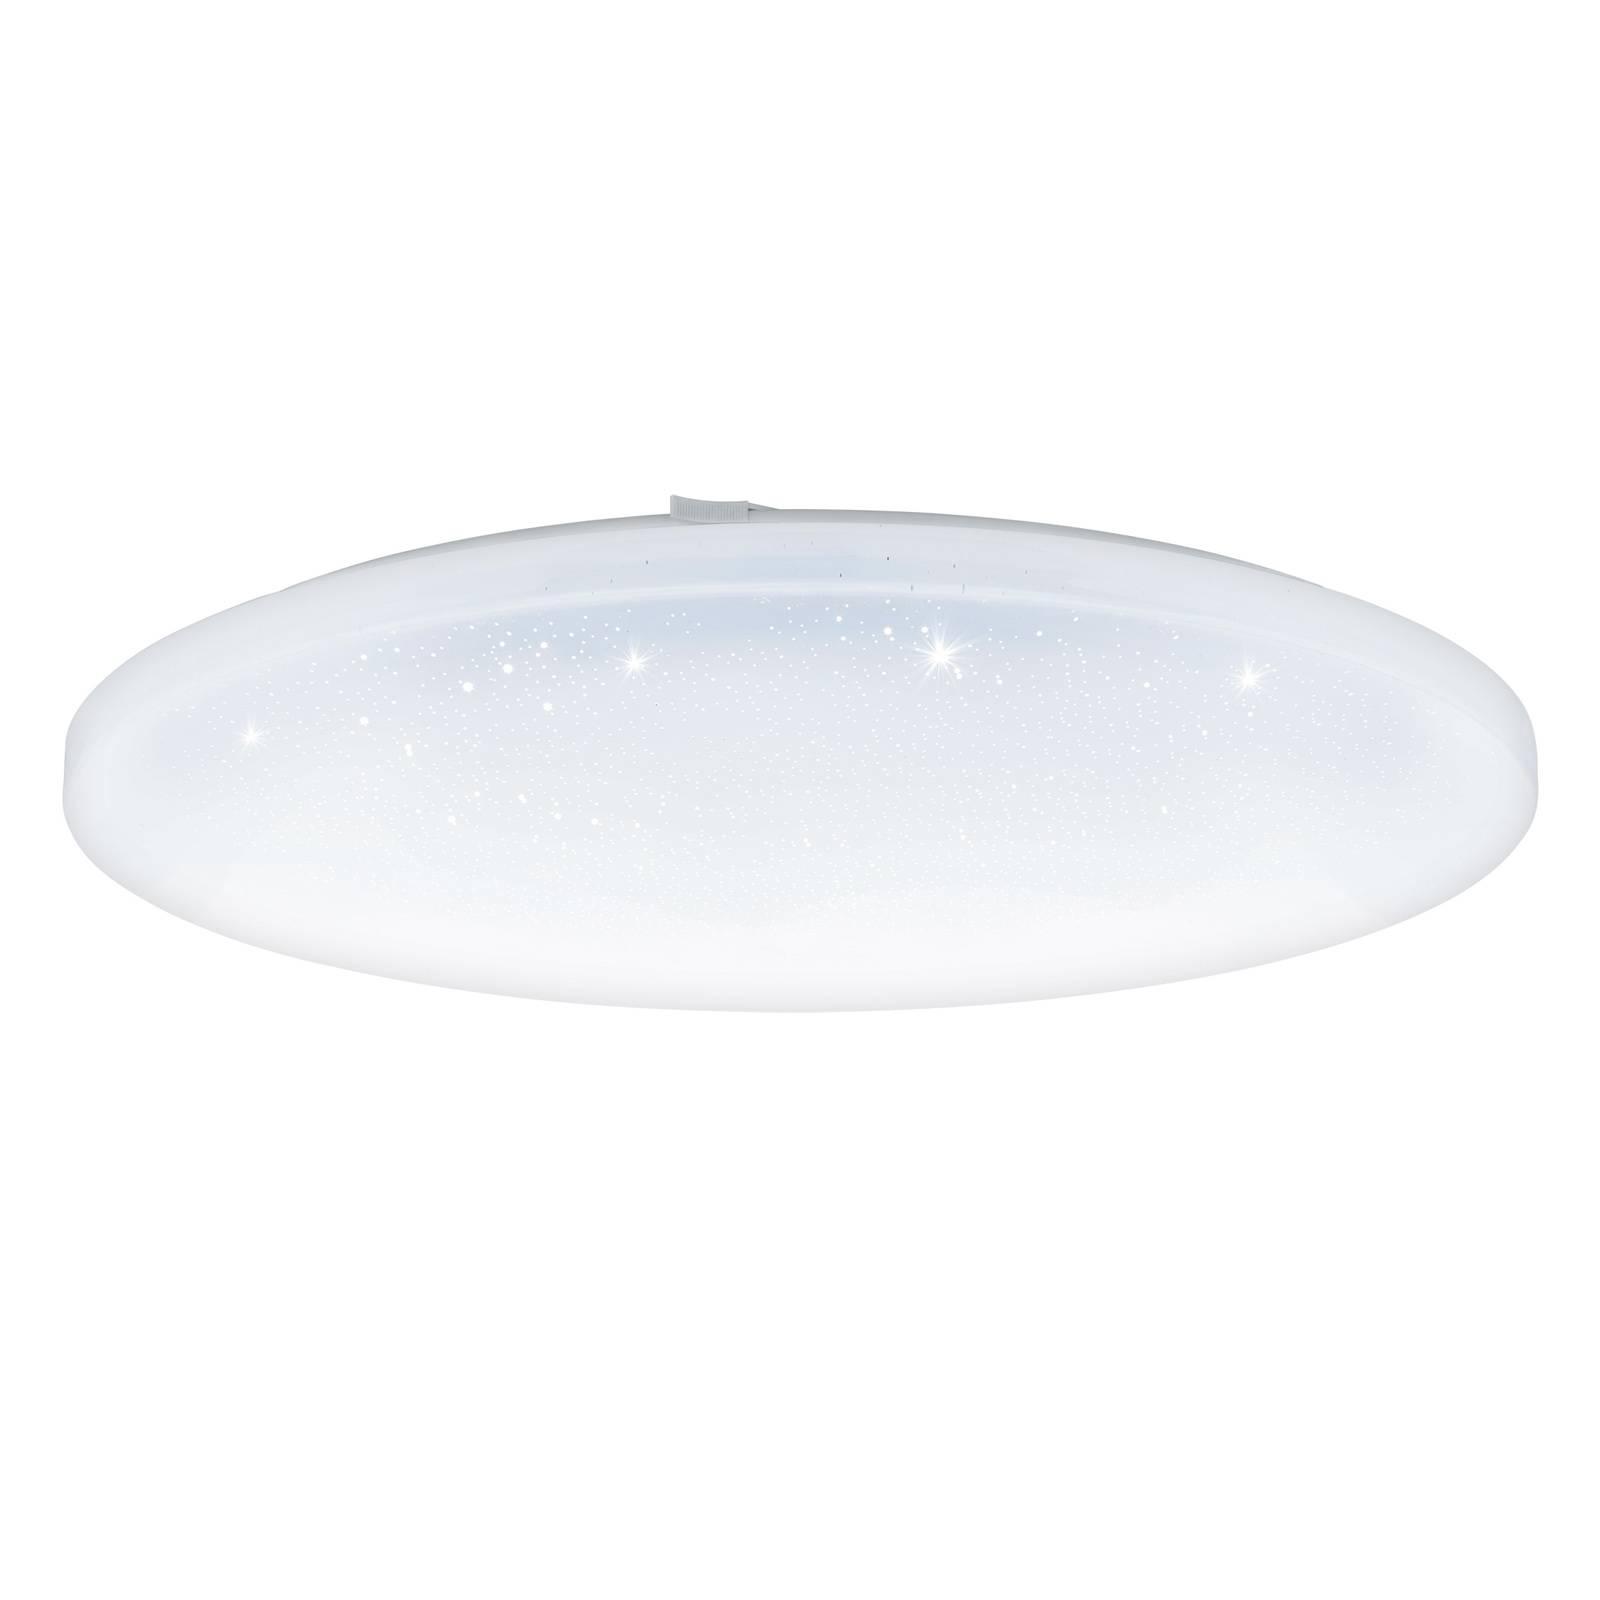 LED-kattovalaisin Frania kristallitehostein